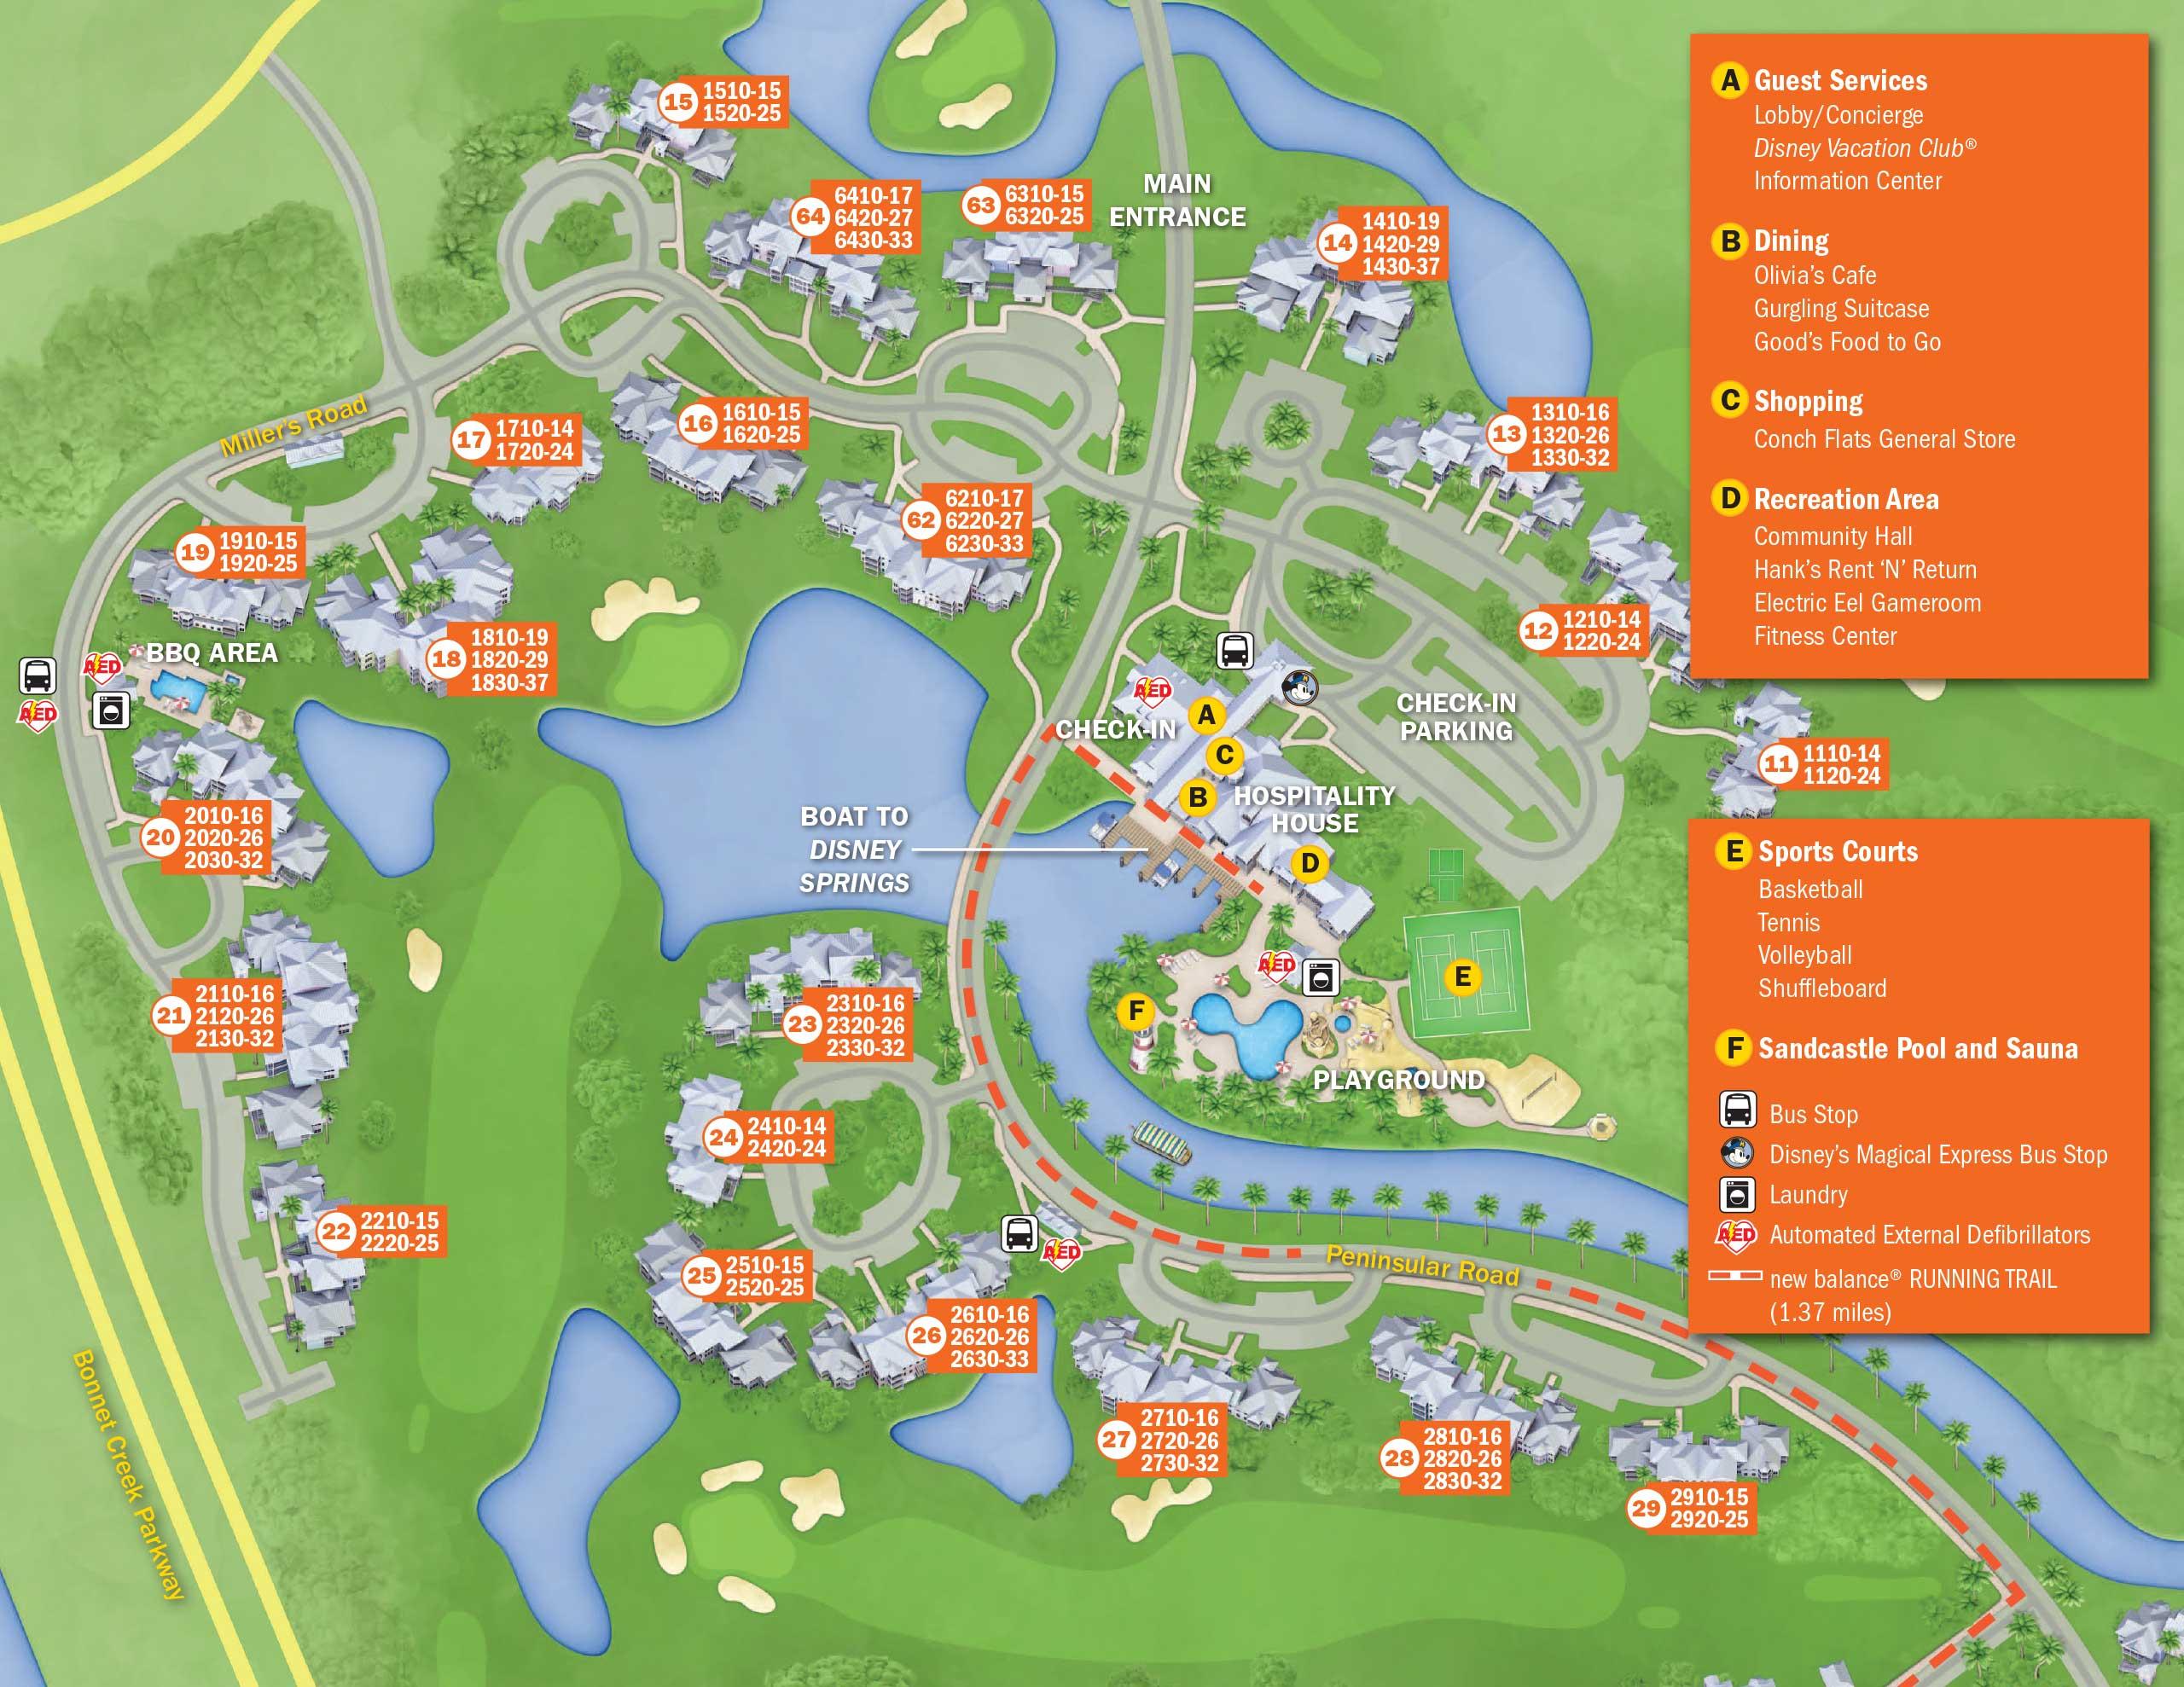 Walt Disney World Map With Hotels.April 2017 Walt Disney World Resort Hotel Maps Photo 27 Of 33